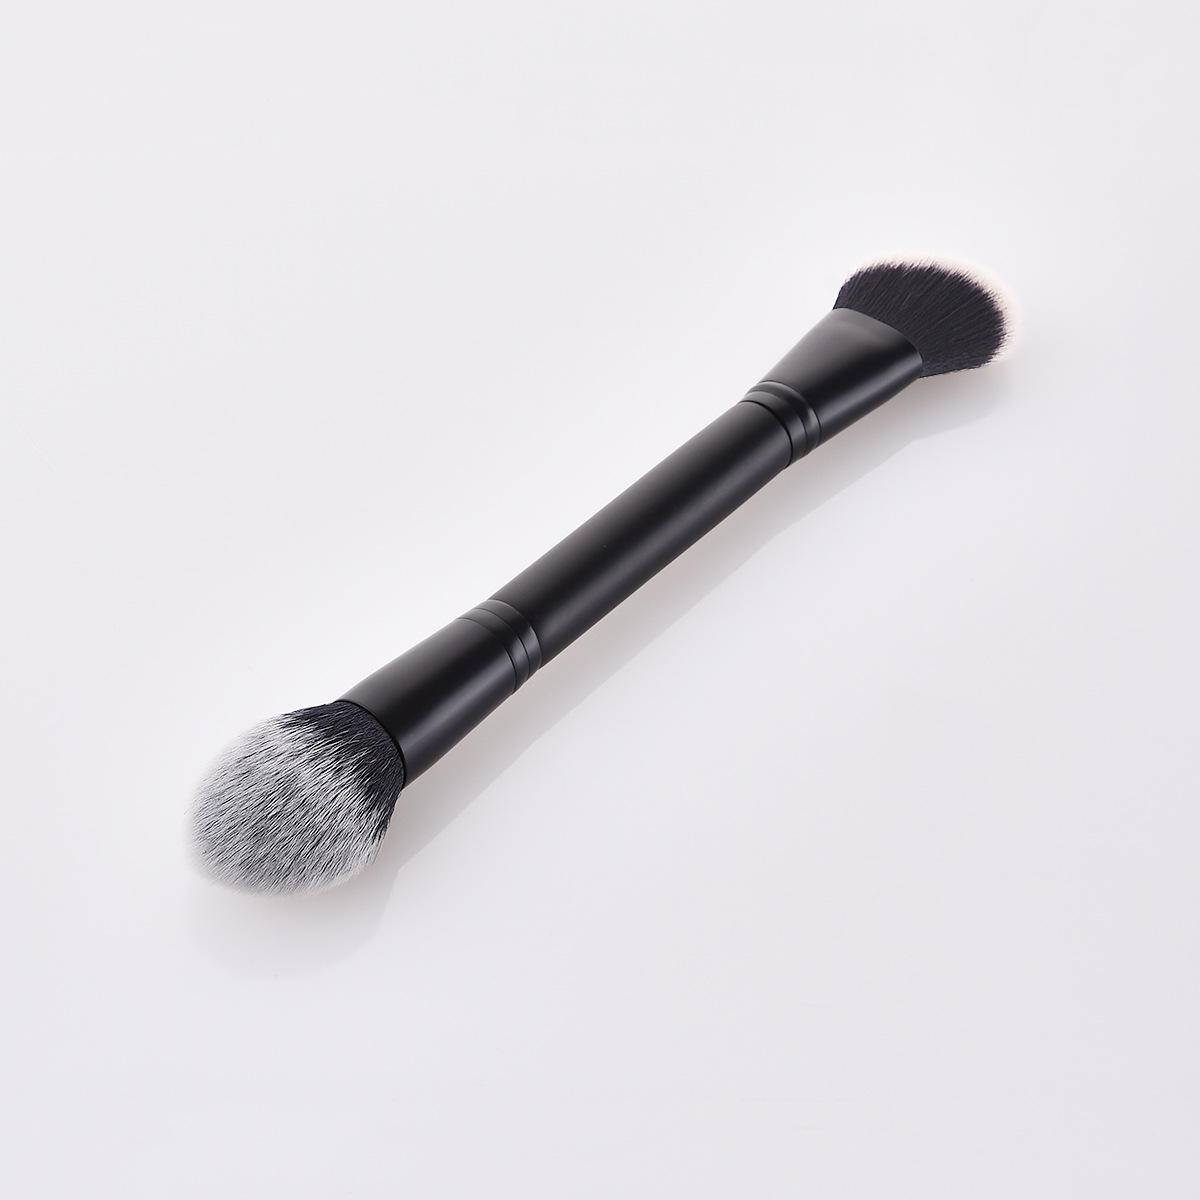 BBL 1Pcs Angled Double Ended Pro Contouring Sculpting Brush Multi-purpose Blender Powder Blush Makeup Brushes Cosmetic Tools 12